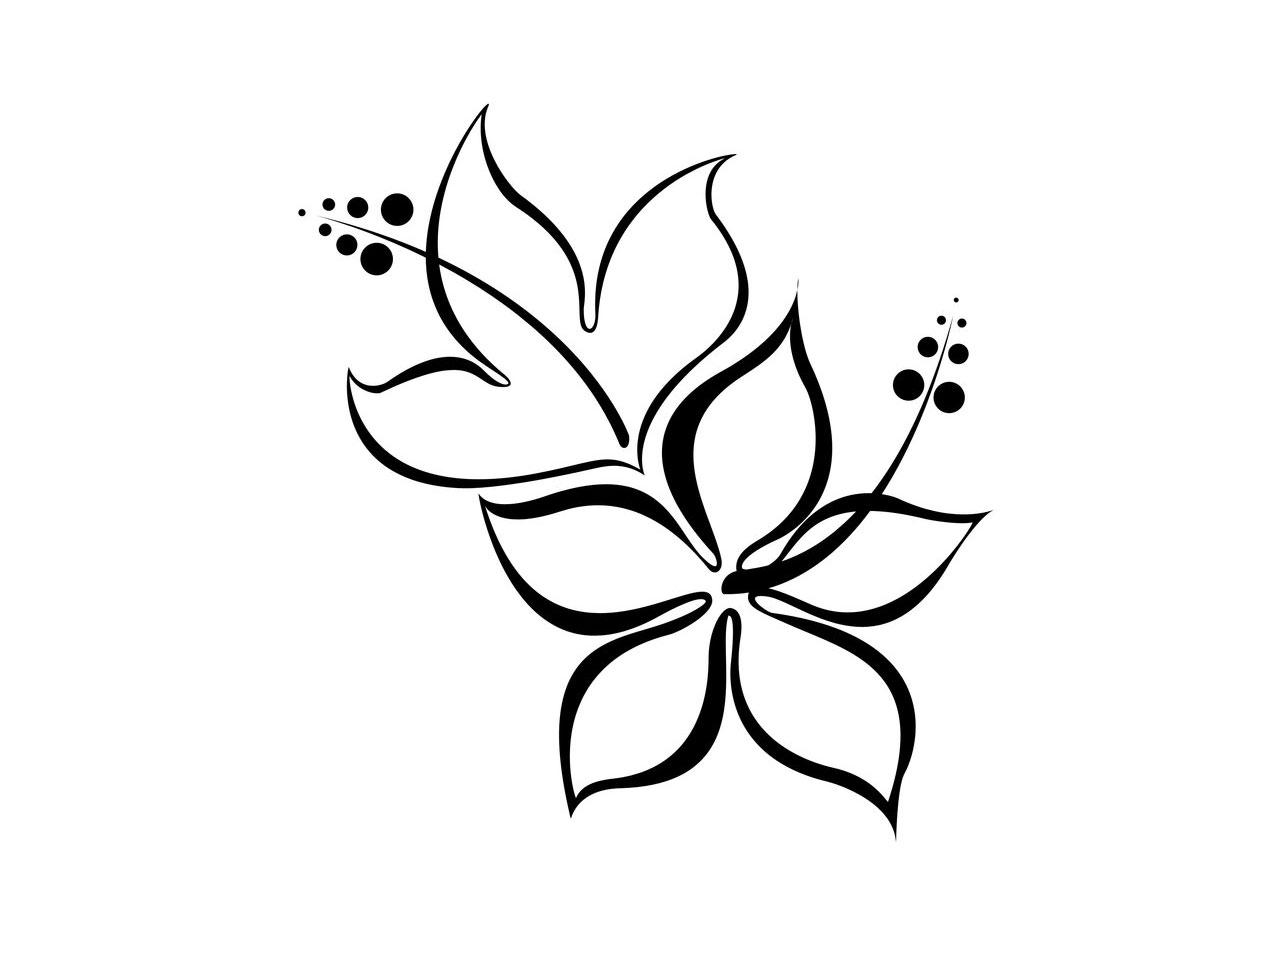 little stars and crescent moon tattoo designs. Black Bedroom Furniture Sets. Home Design Ideas